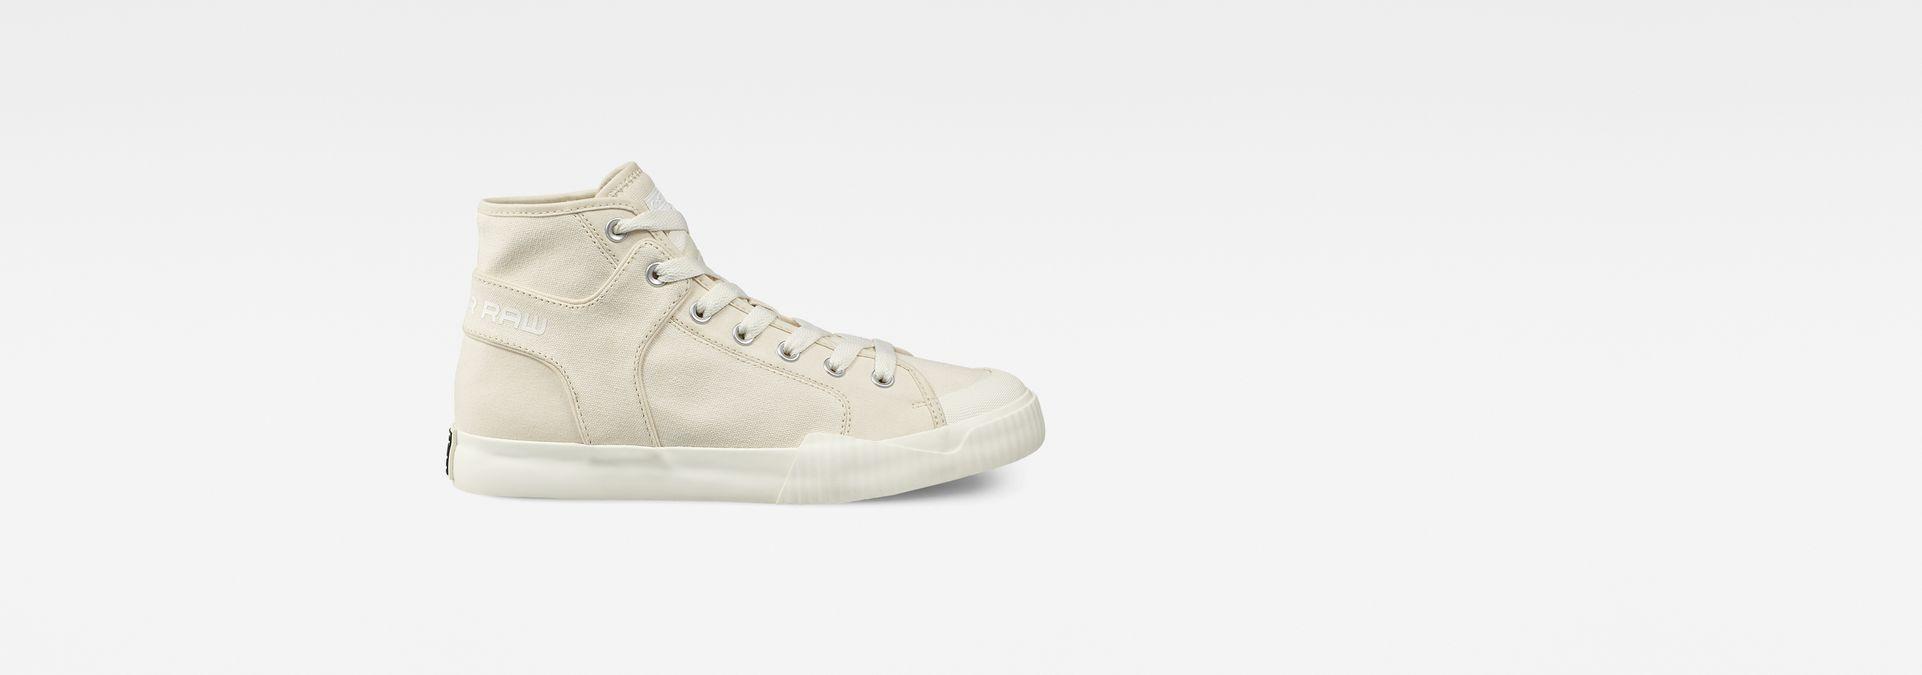 793898e6e8d Rackam Tendric Mid Sneakers | Bisque | Men | G-Star RAW®